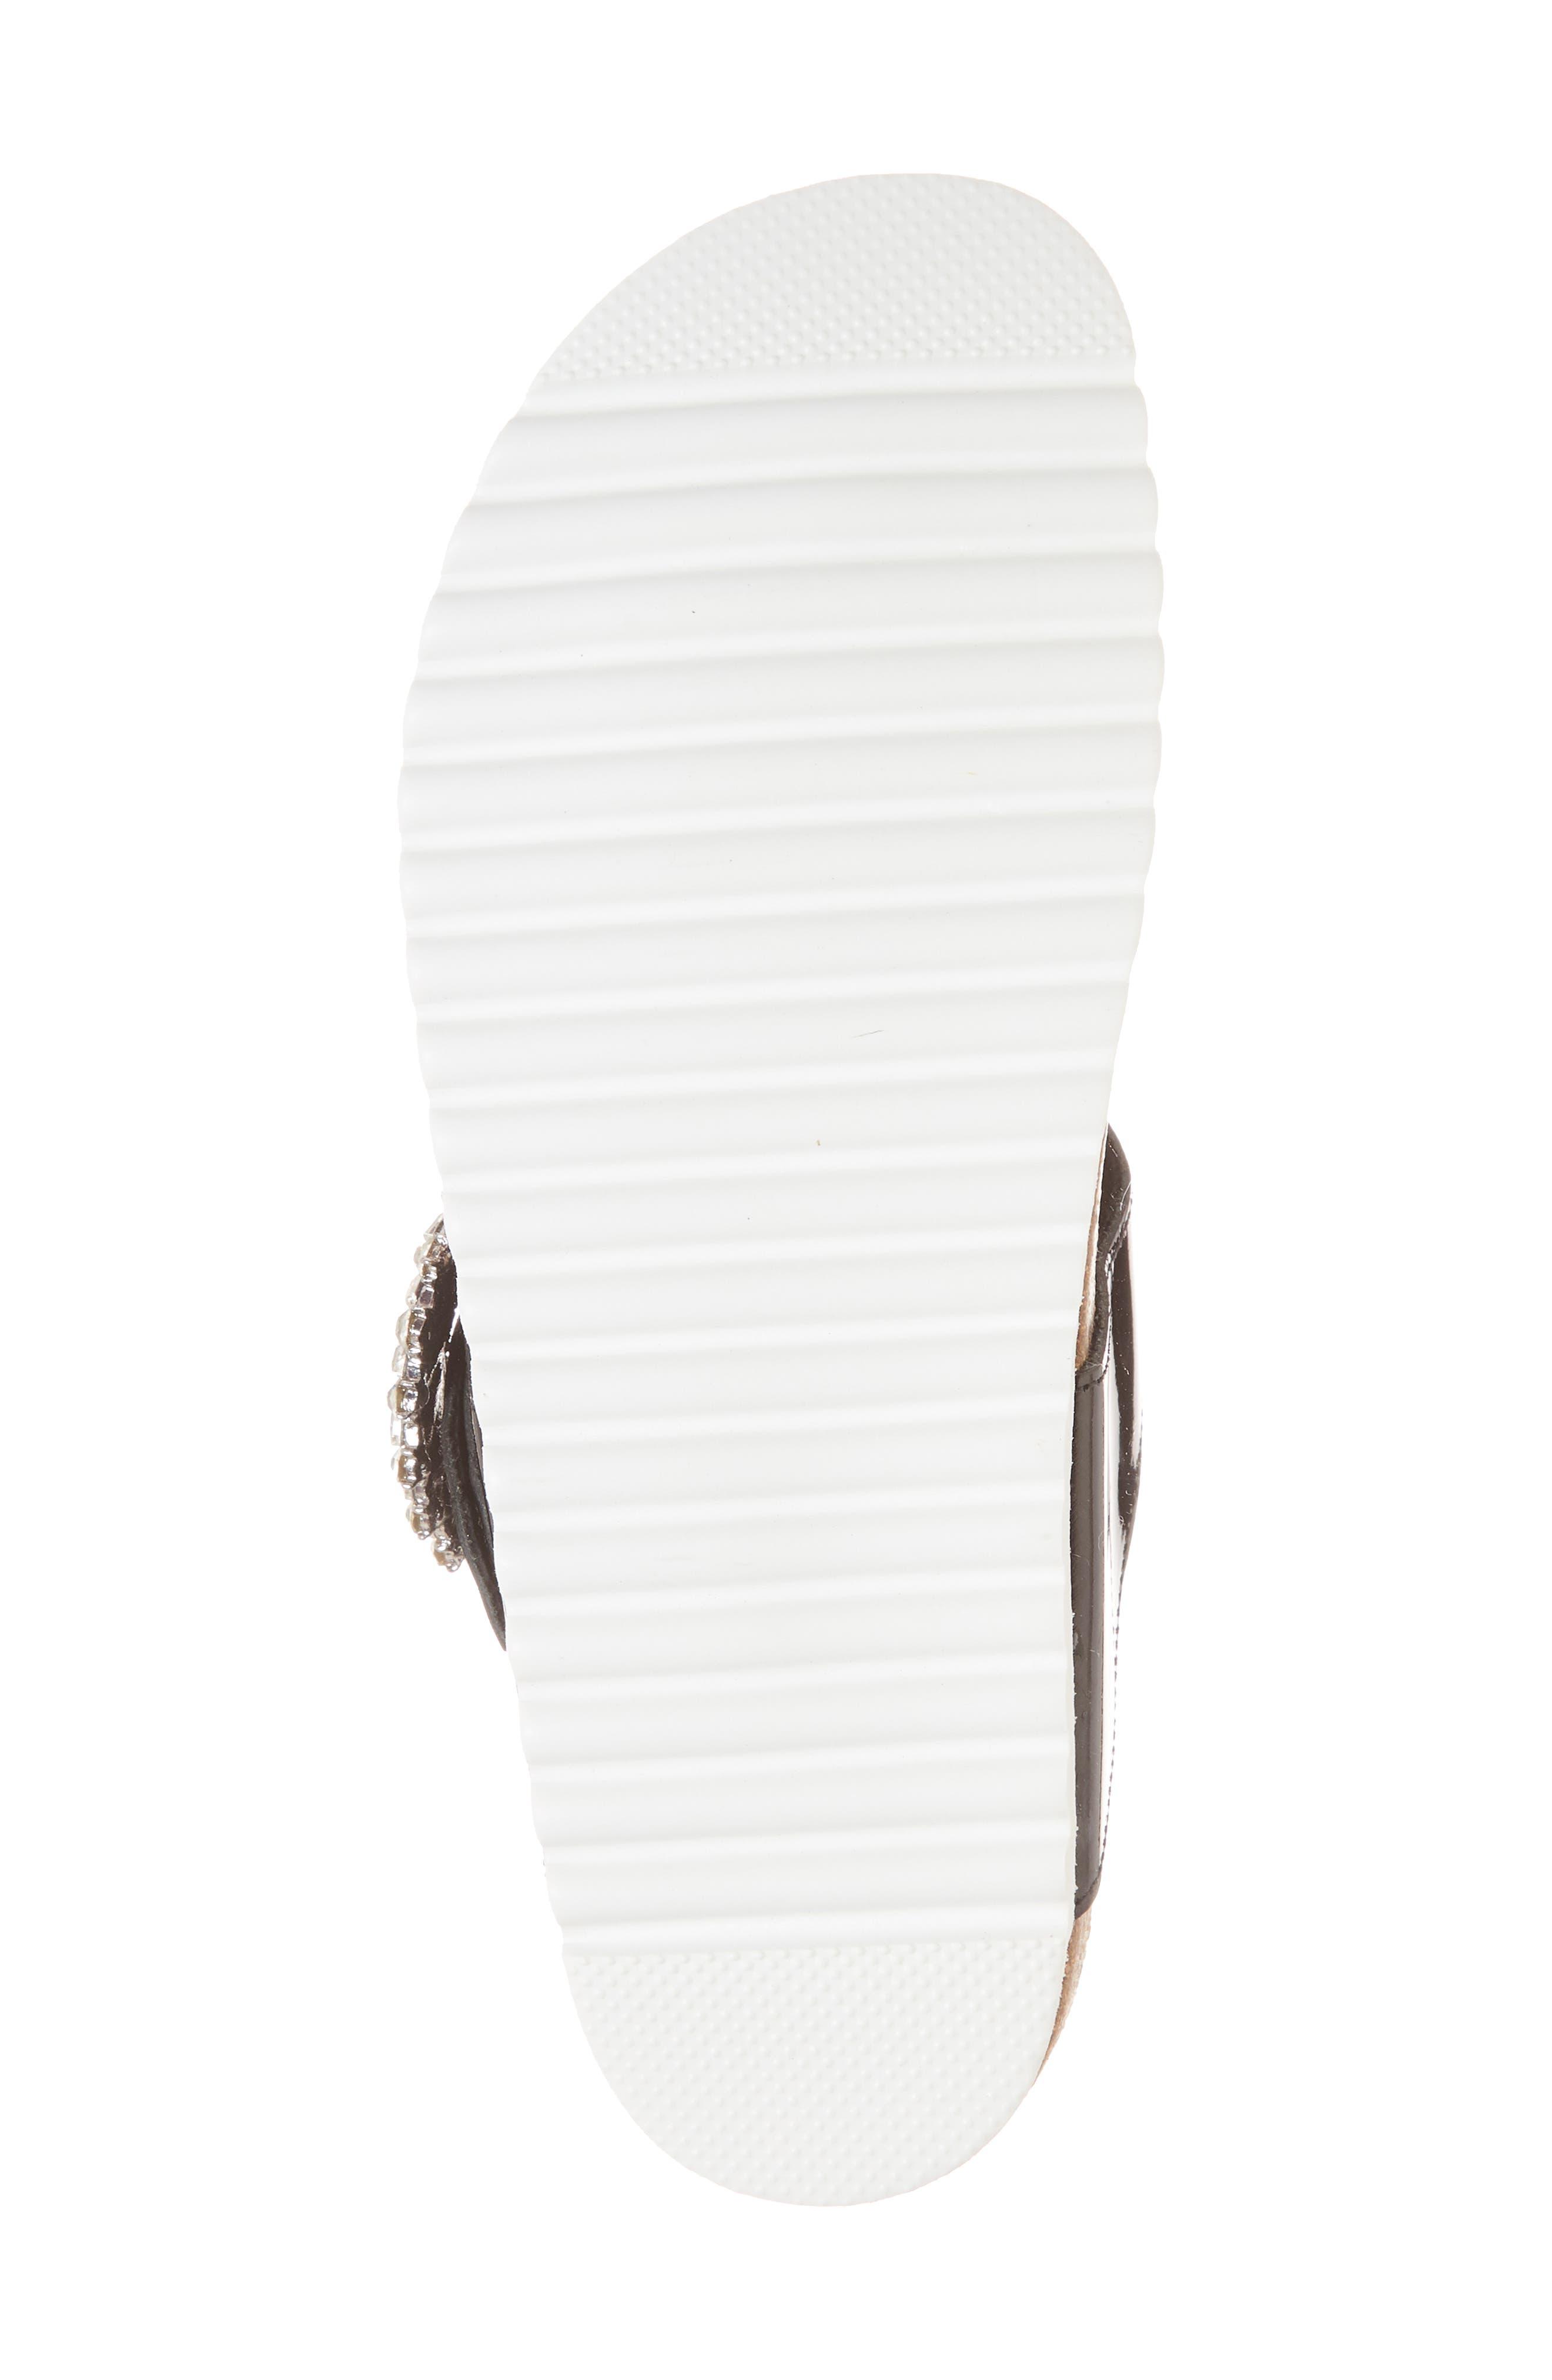 Madeira Embellished T-Strap Sandal,                             Alternate thumbnail 6, color,                             Black Patent/ Black Silver